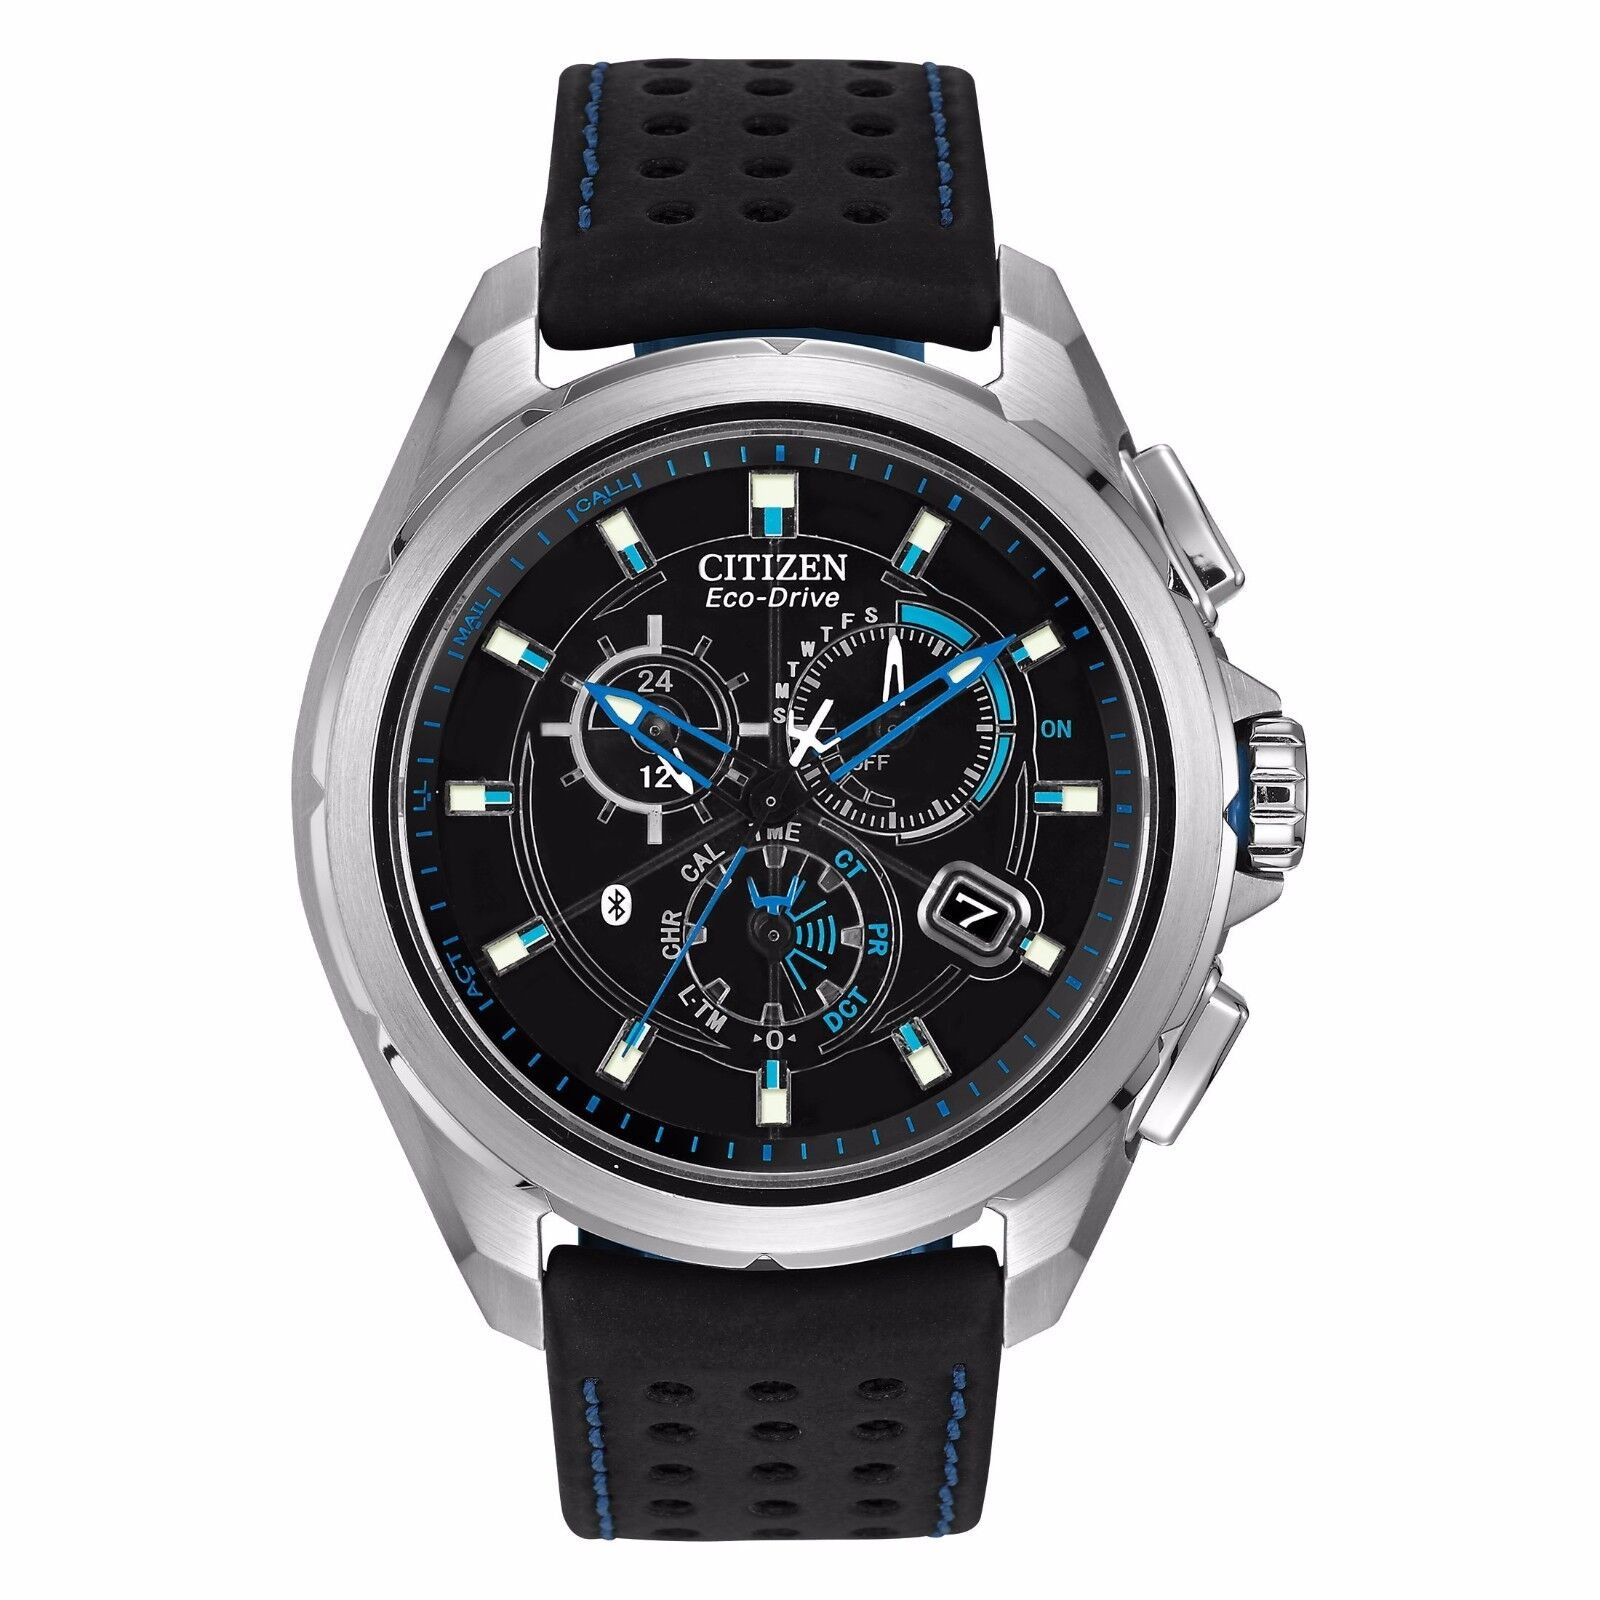 Citizen Eco-Drive Men's AT7030-05E Proximity Bluetooth Black Leather Strap Watch